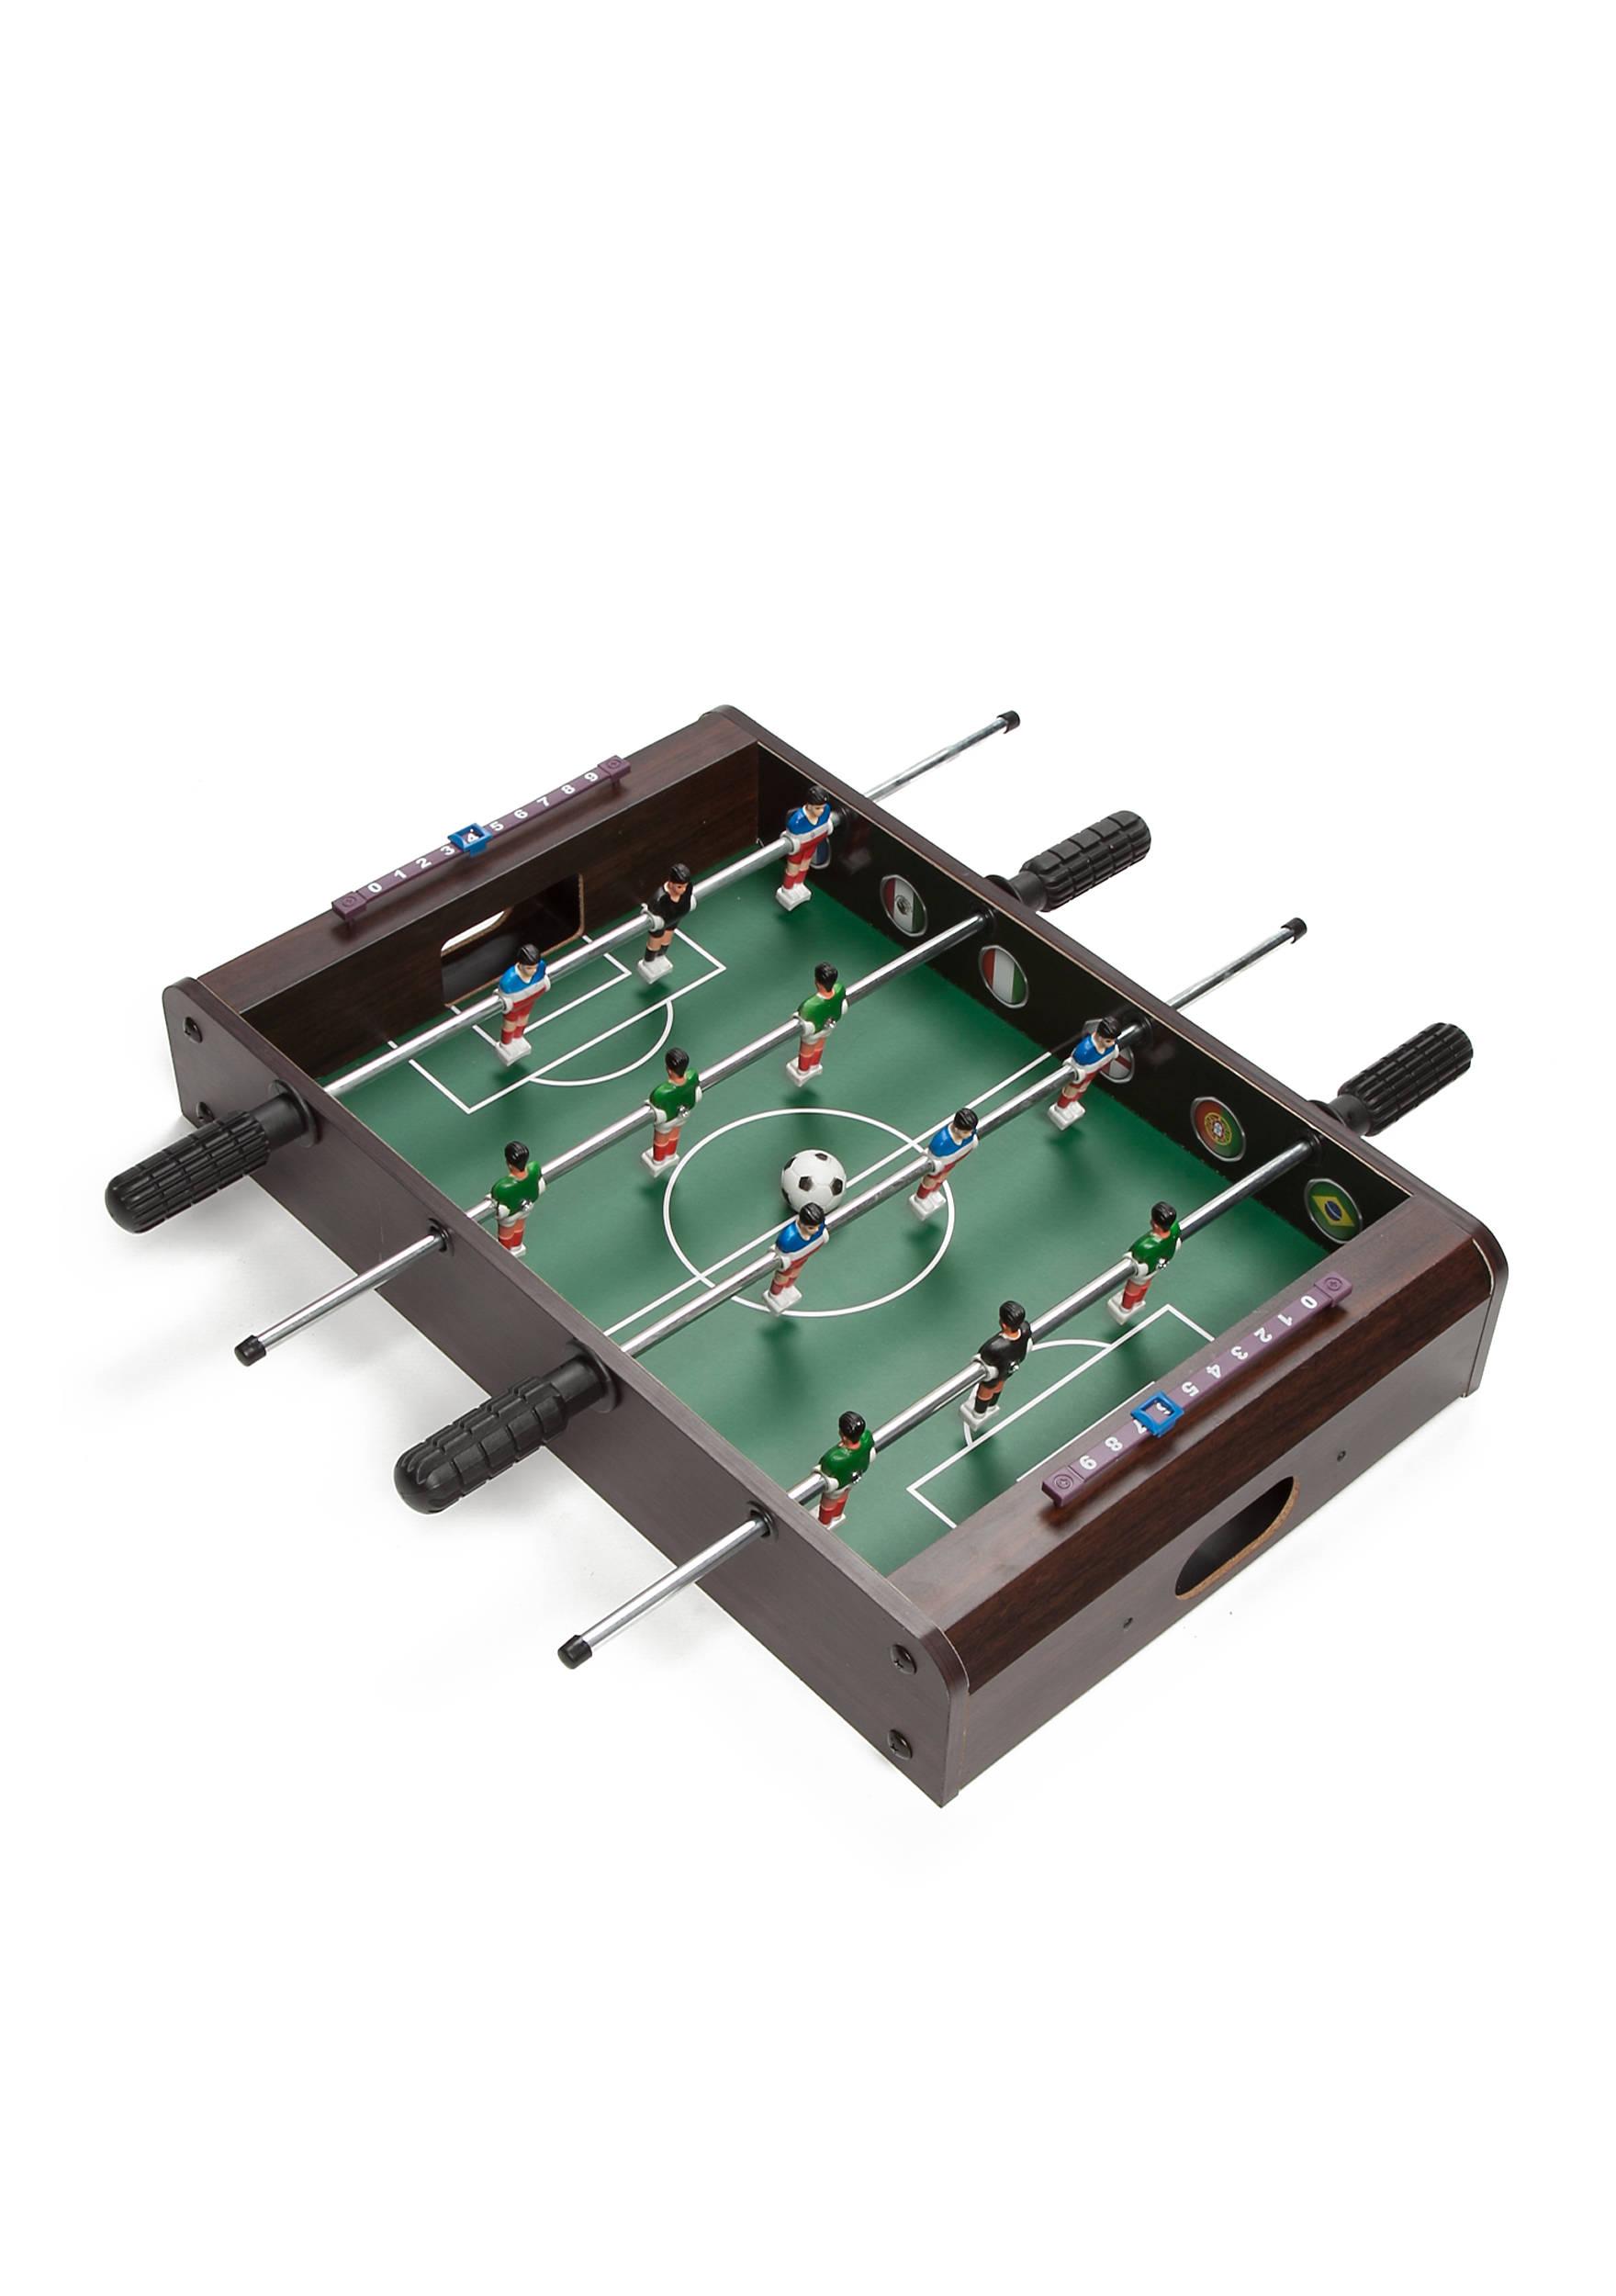 Saddlebred® Table Top Foosball | belk